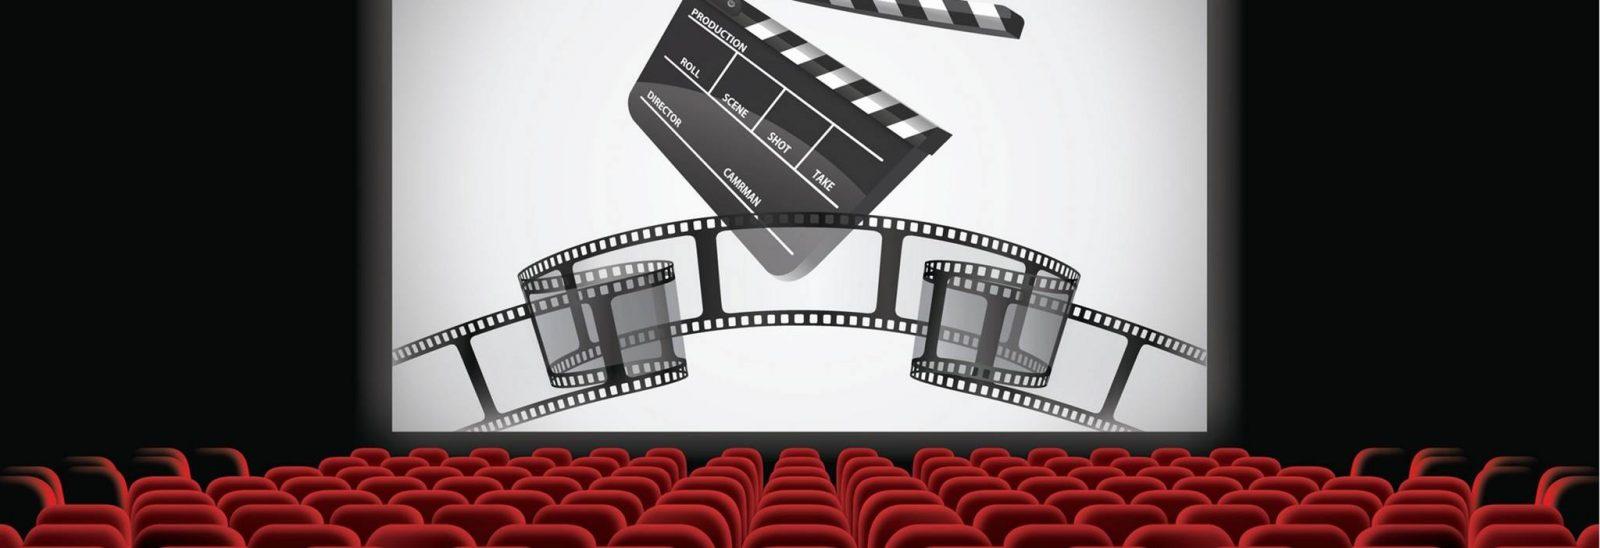 Cinema Jeanne d'Arc Muzillac Morbihan Bretagne Sud